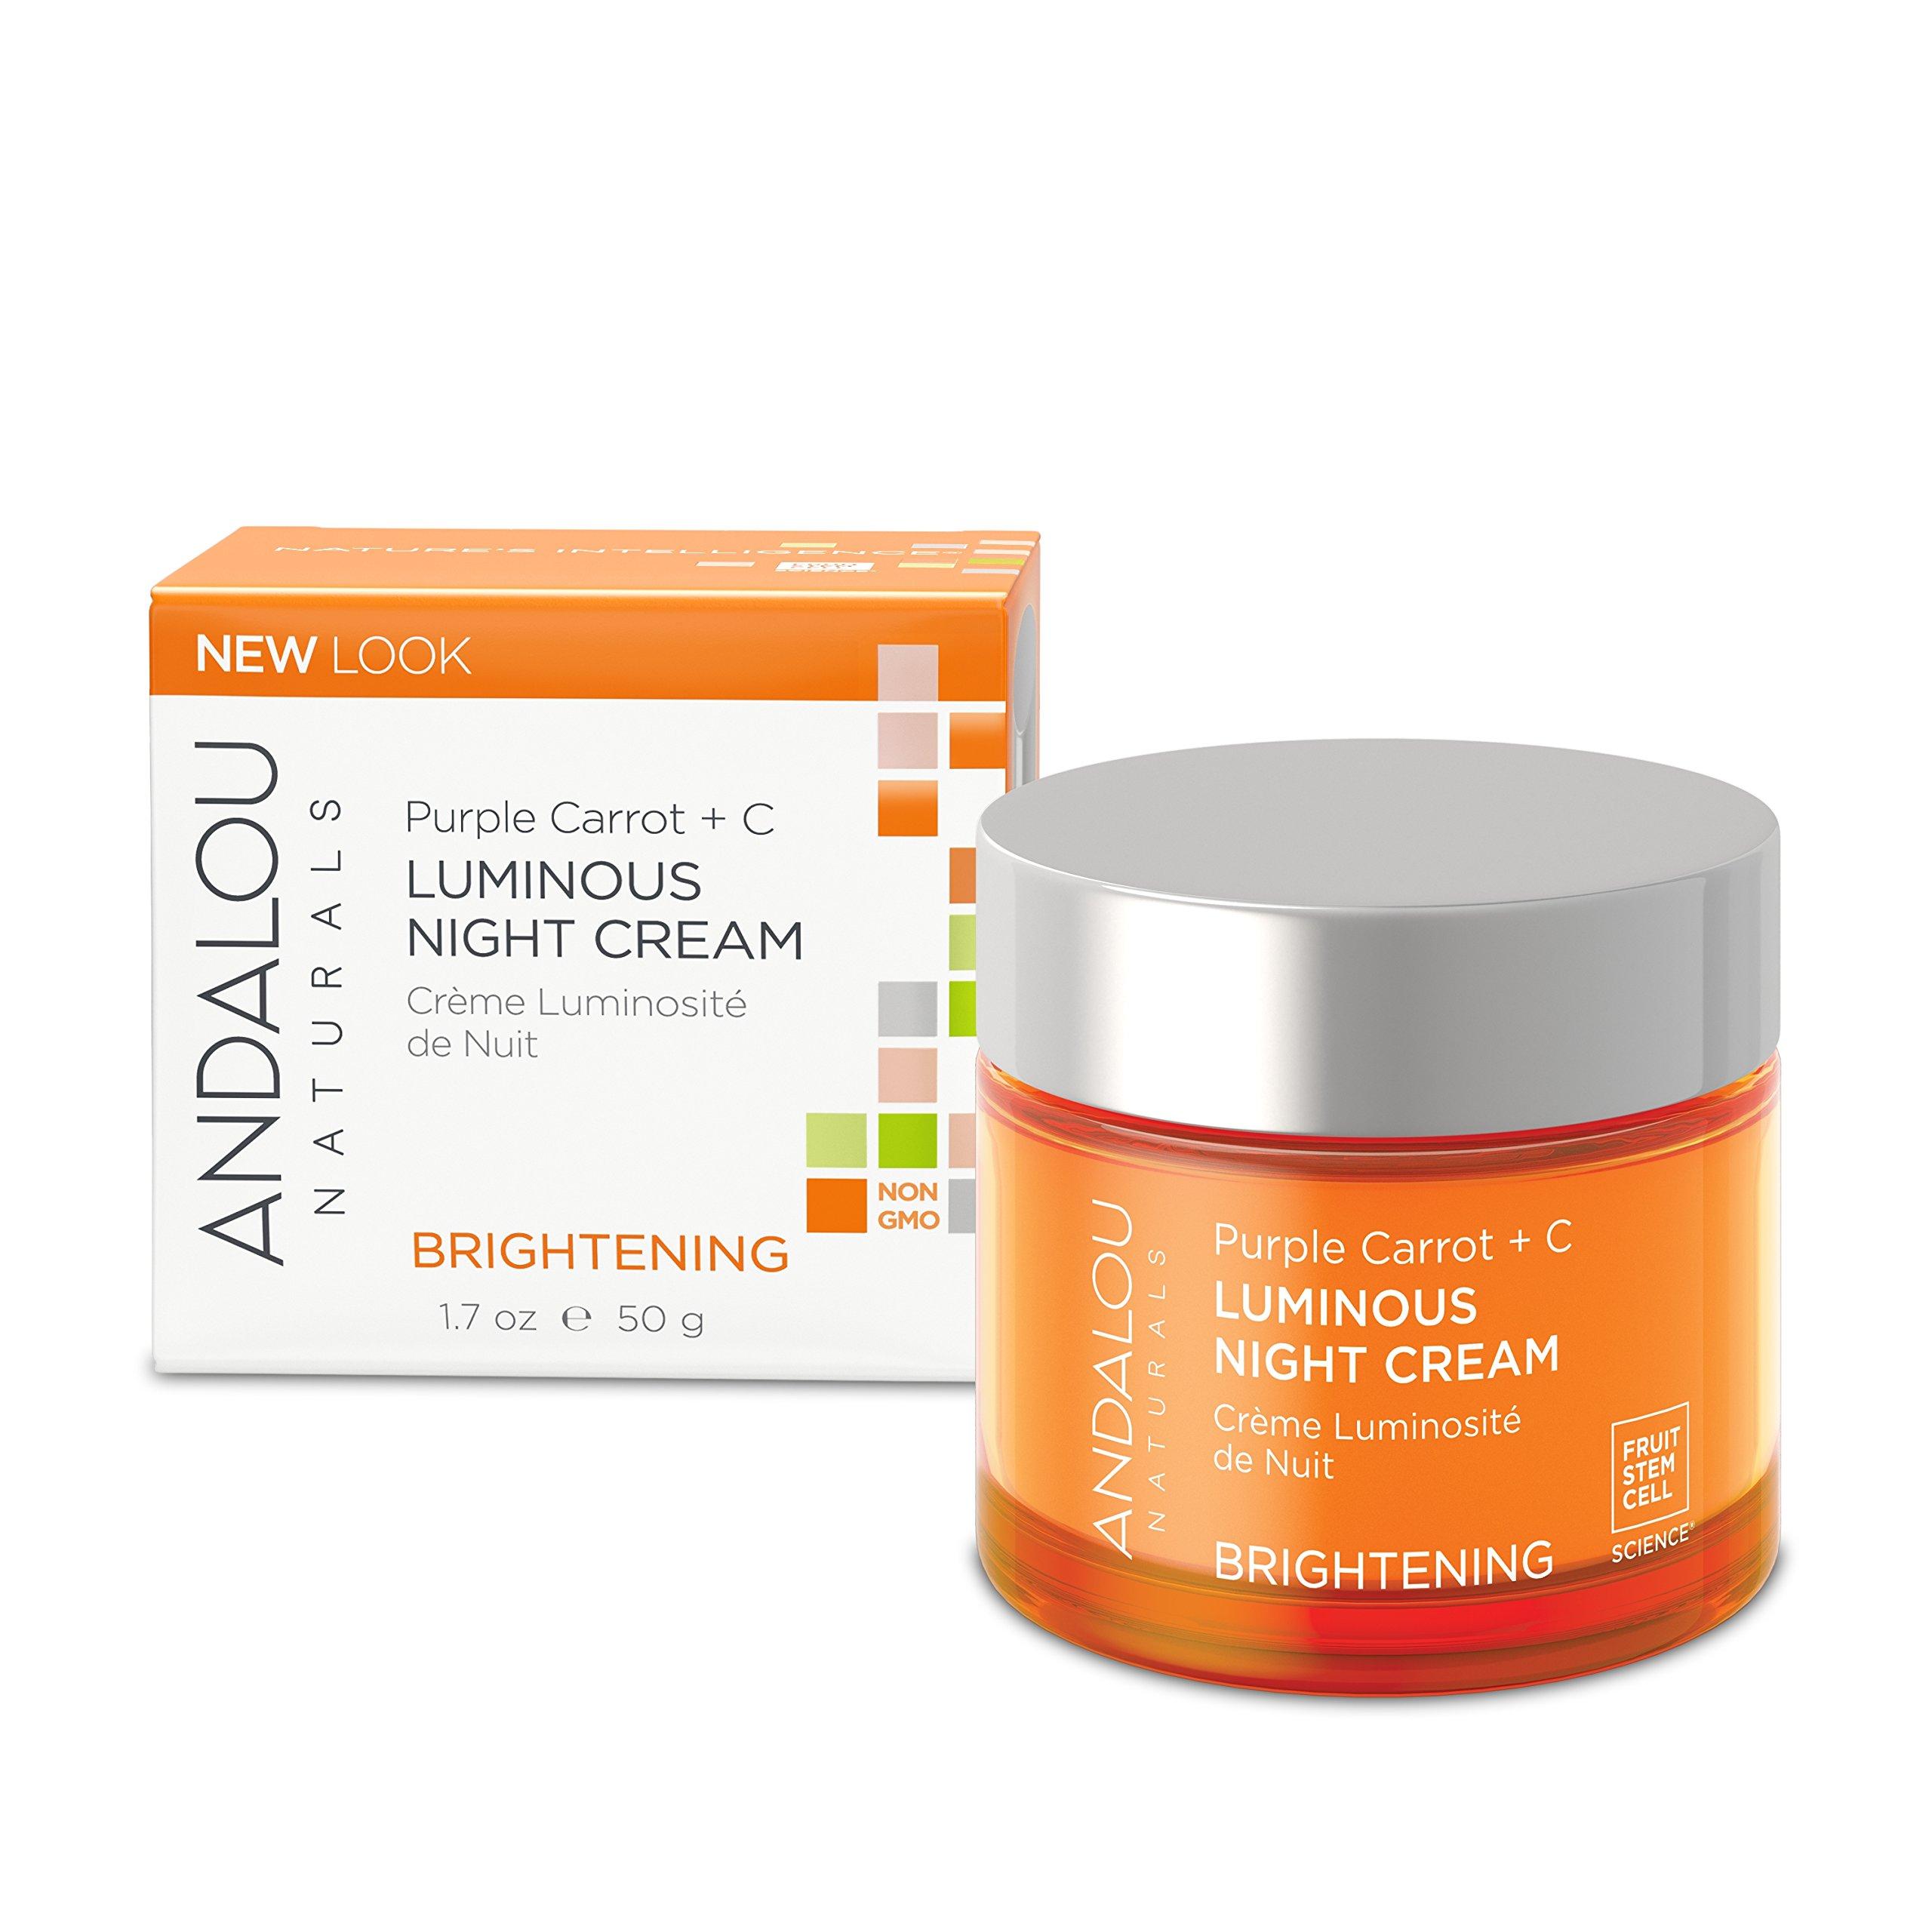 Andalou Naturals Purple Carrot + C Luminous Night Cream, 1.7 oz, Antioxidant Rich Night Cream to Help Firm, Tone & Even Skin